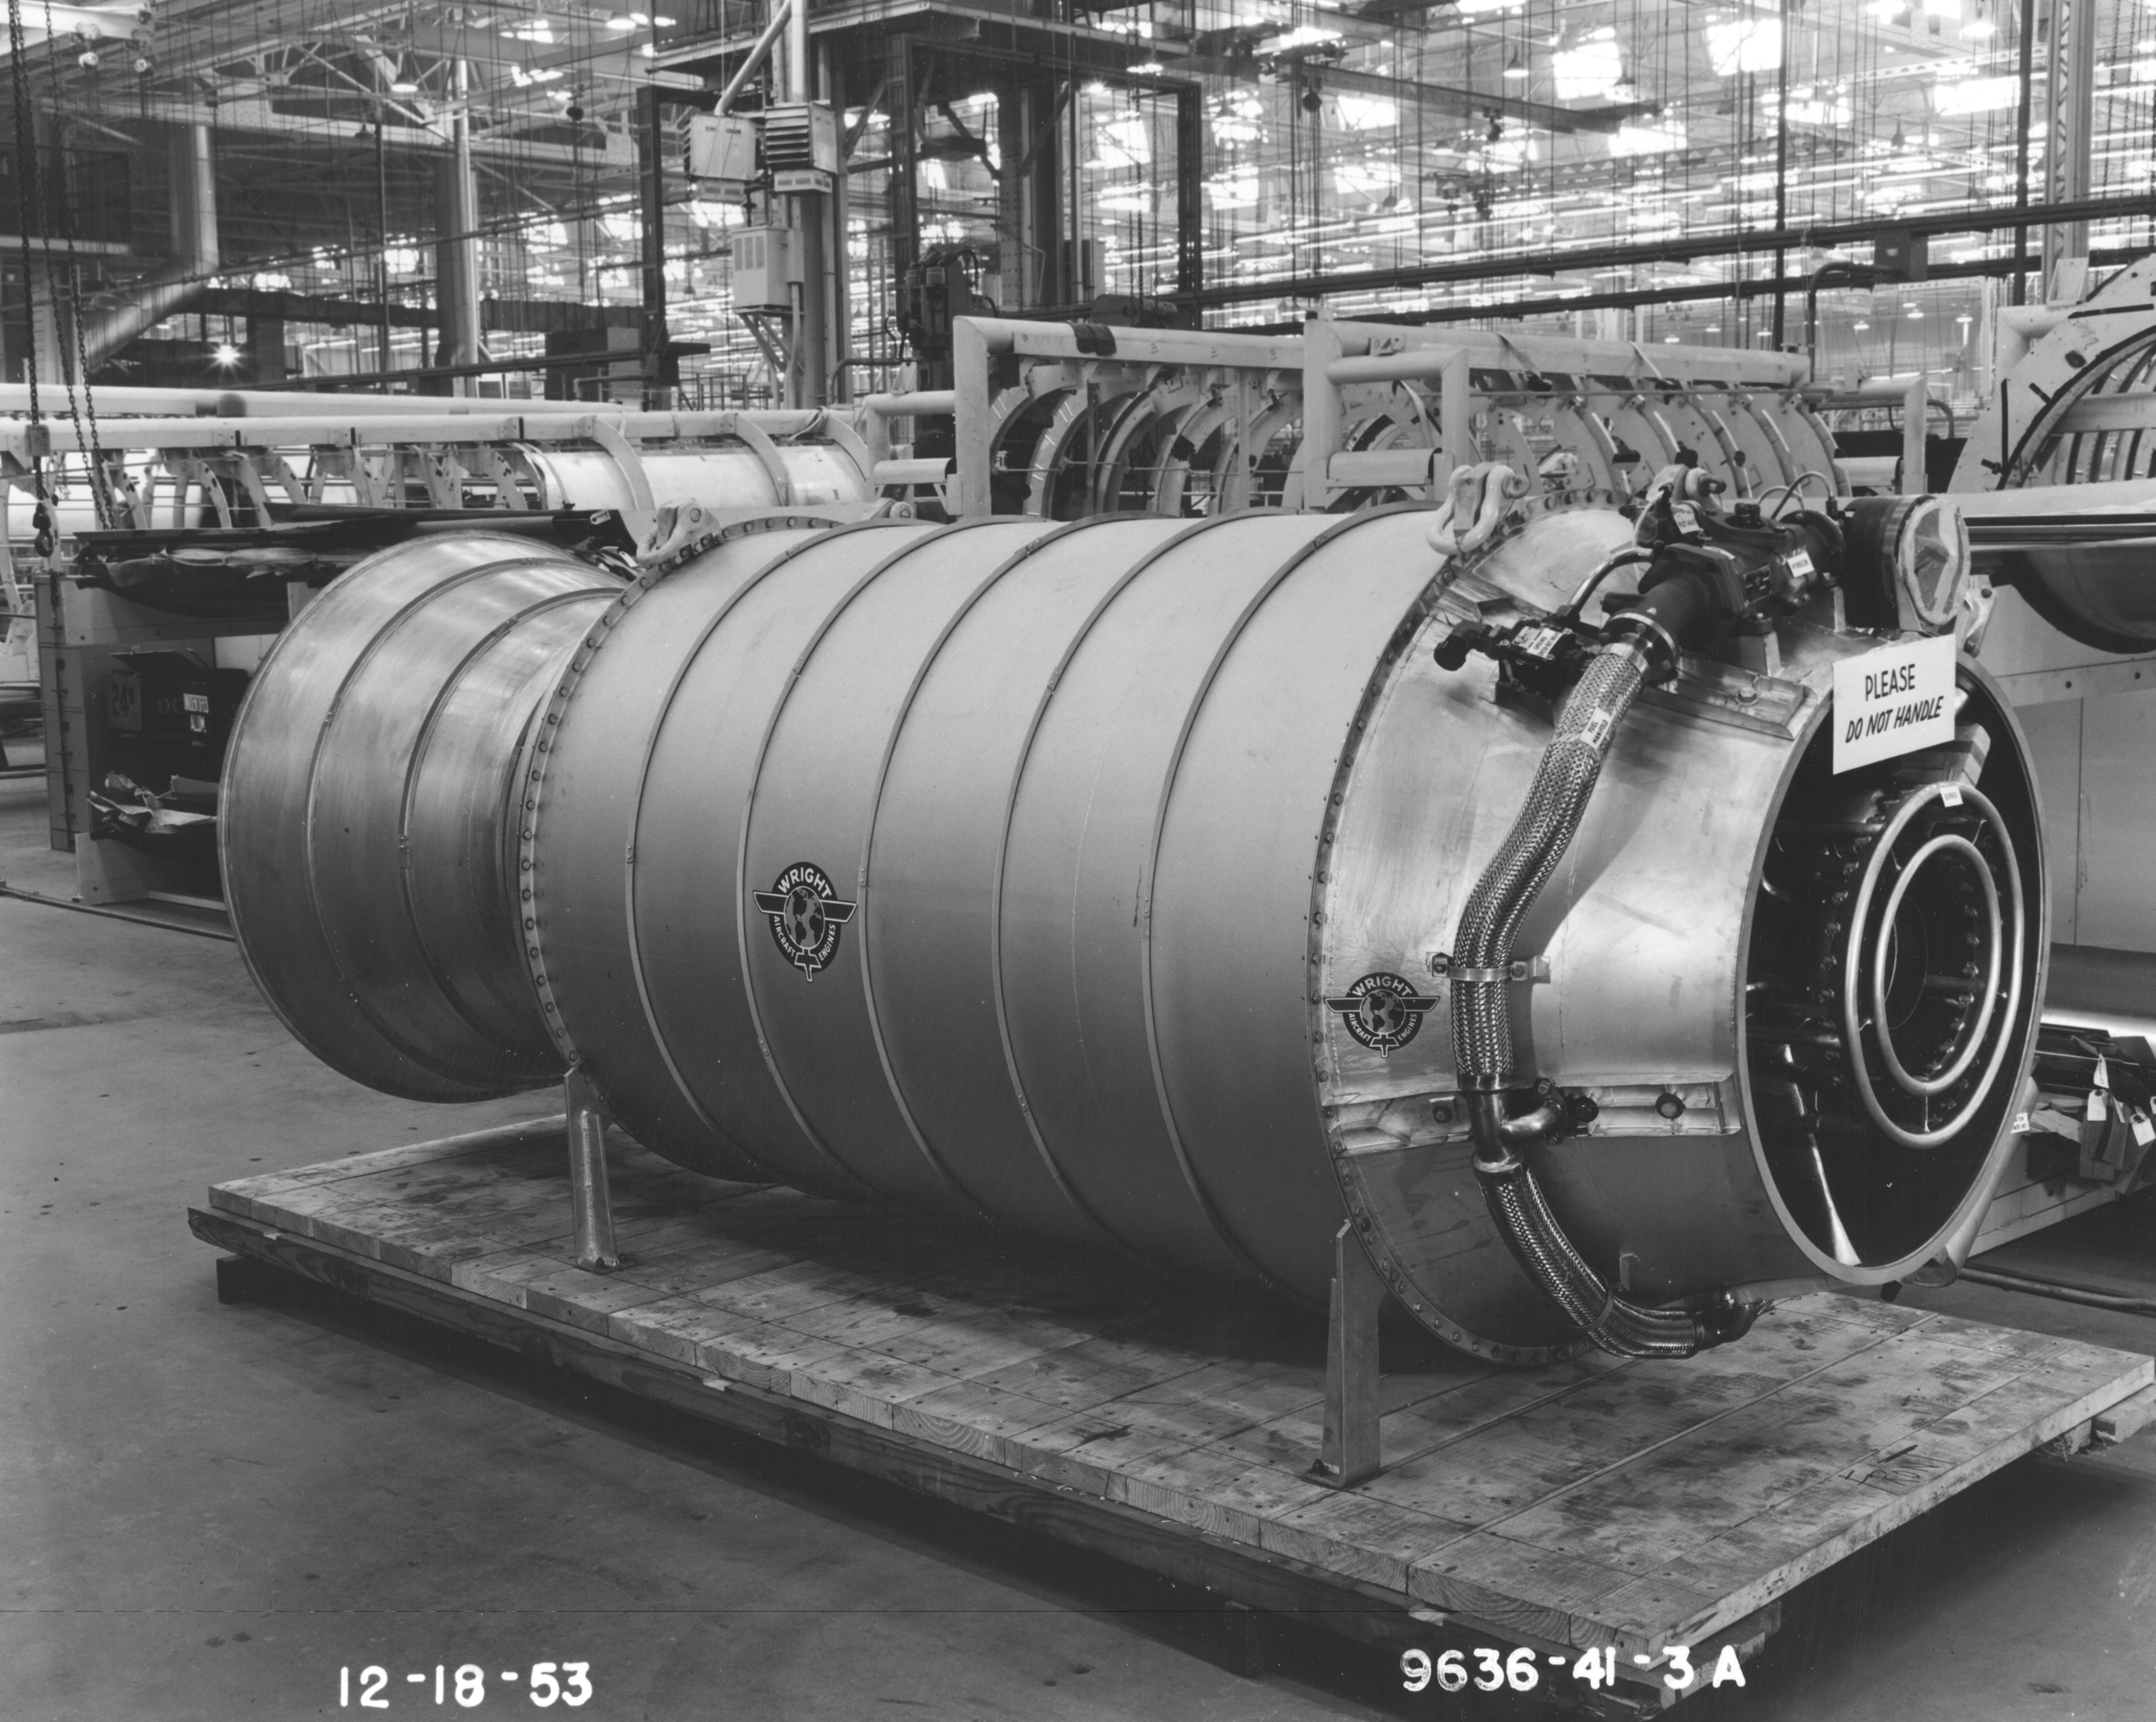 X-10 Engine